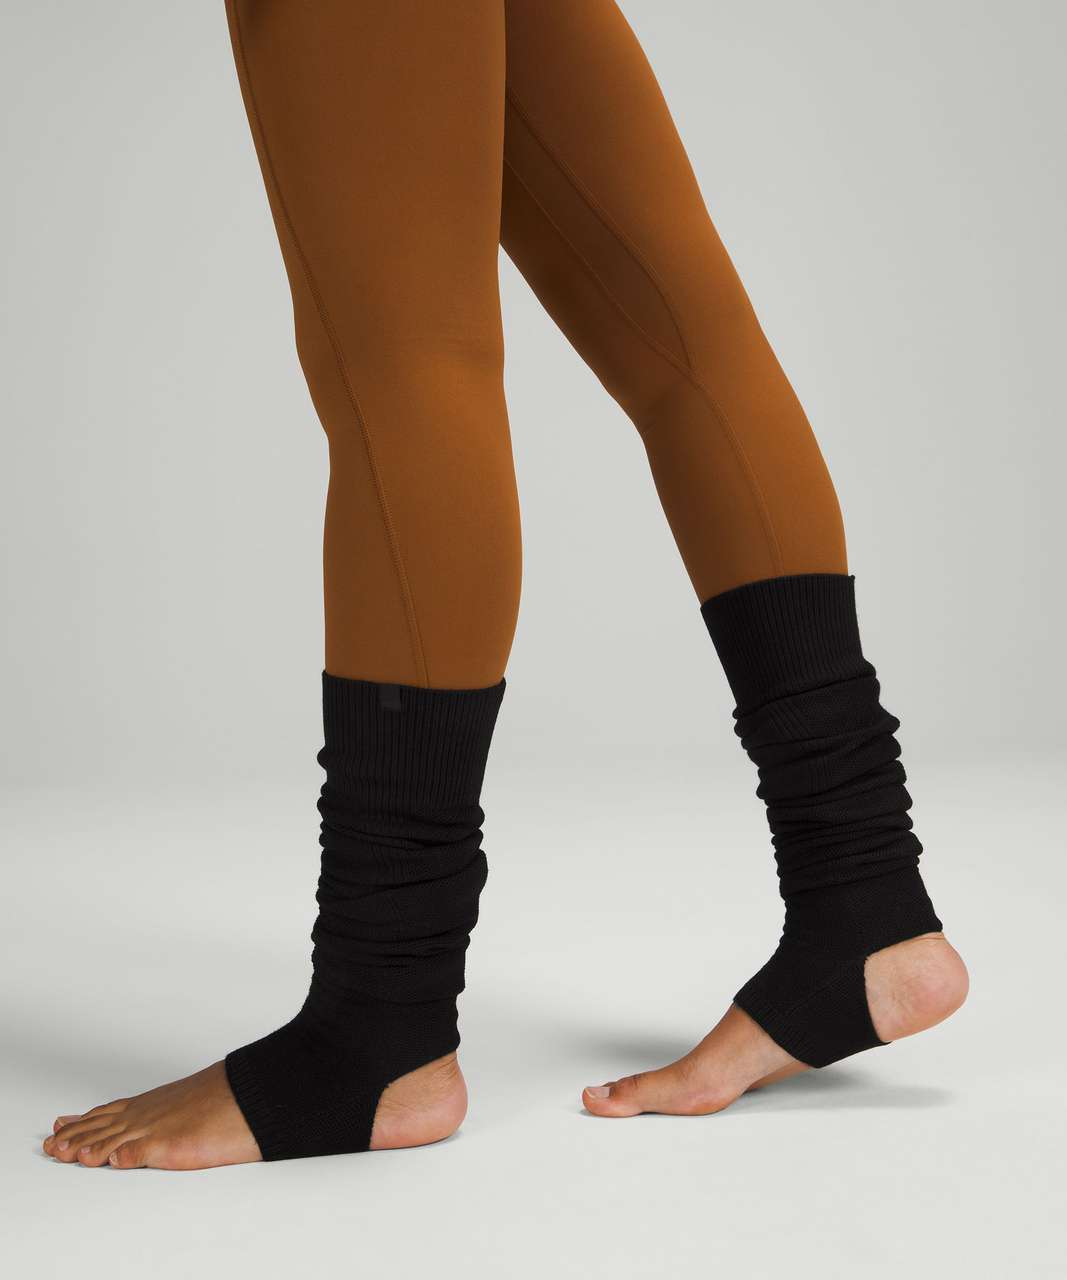 Lululemon Evolution Leg Warmer - Black